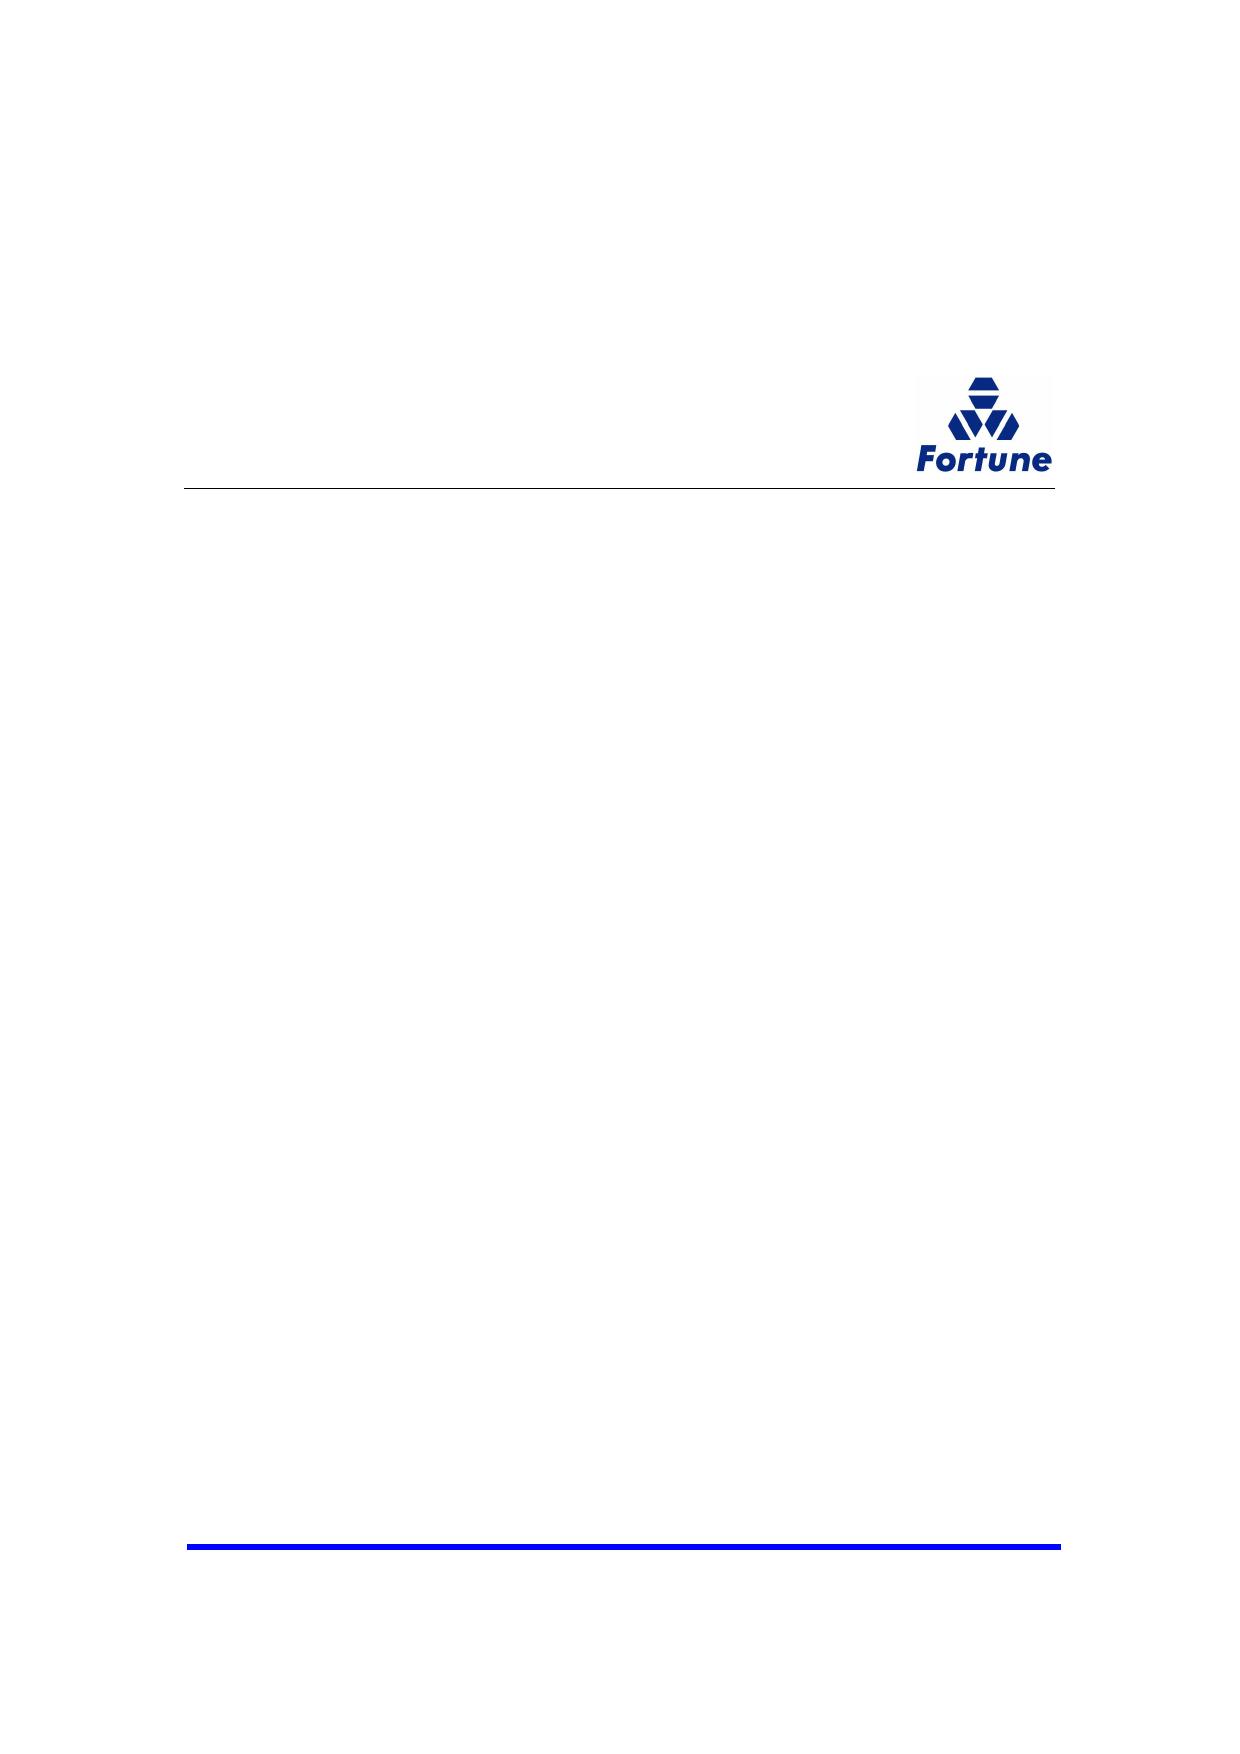 FS9721-LP3 datasheet